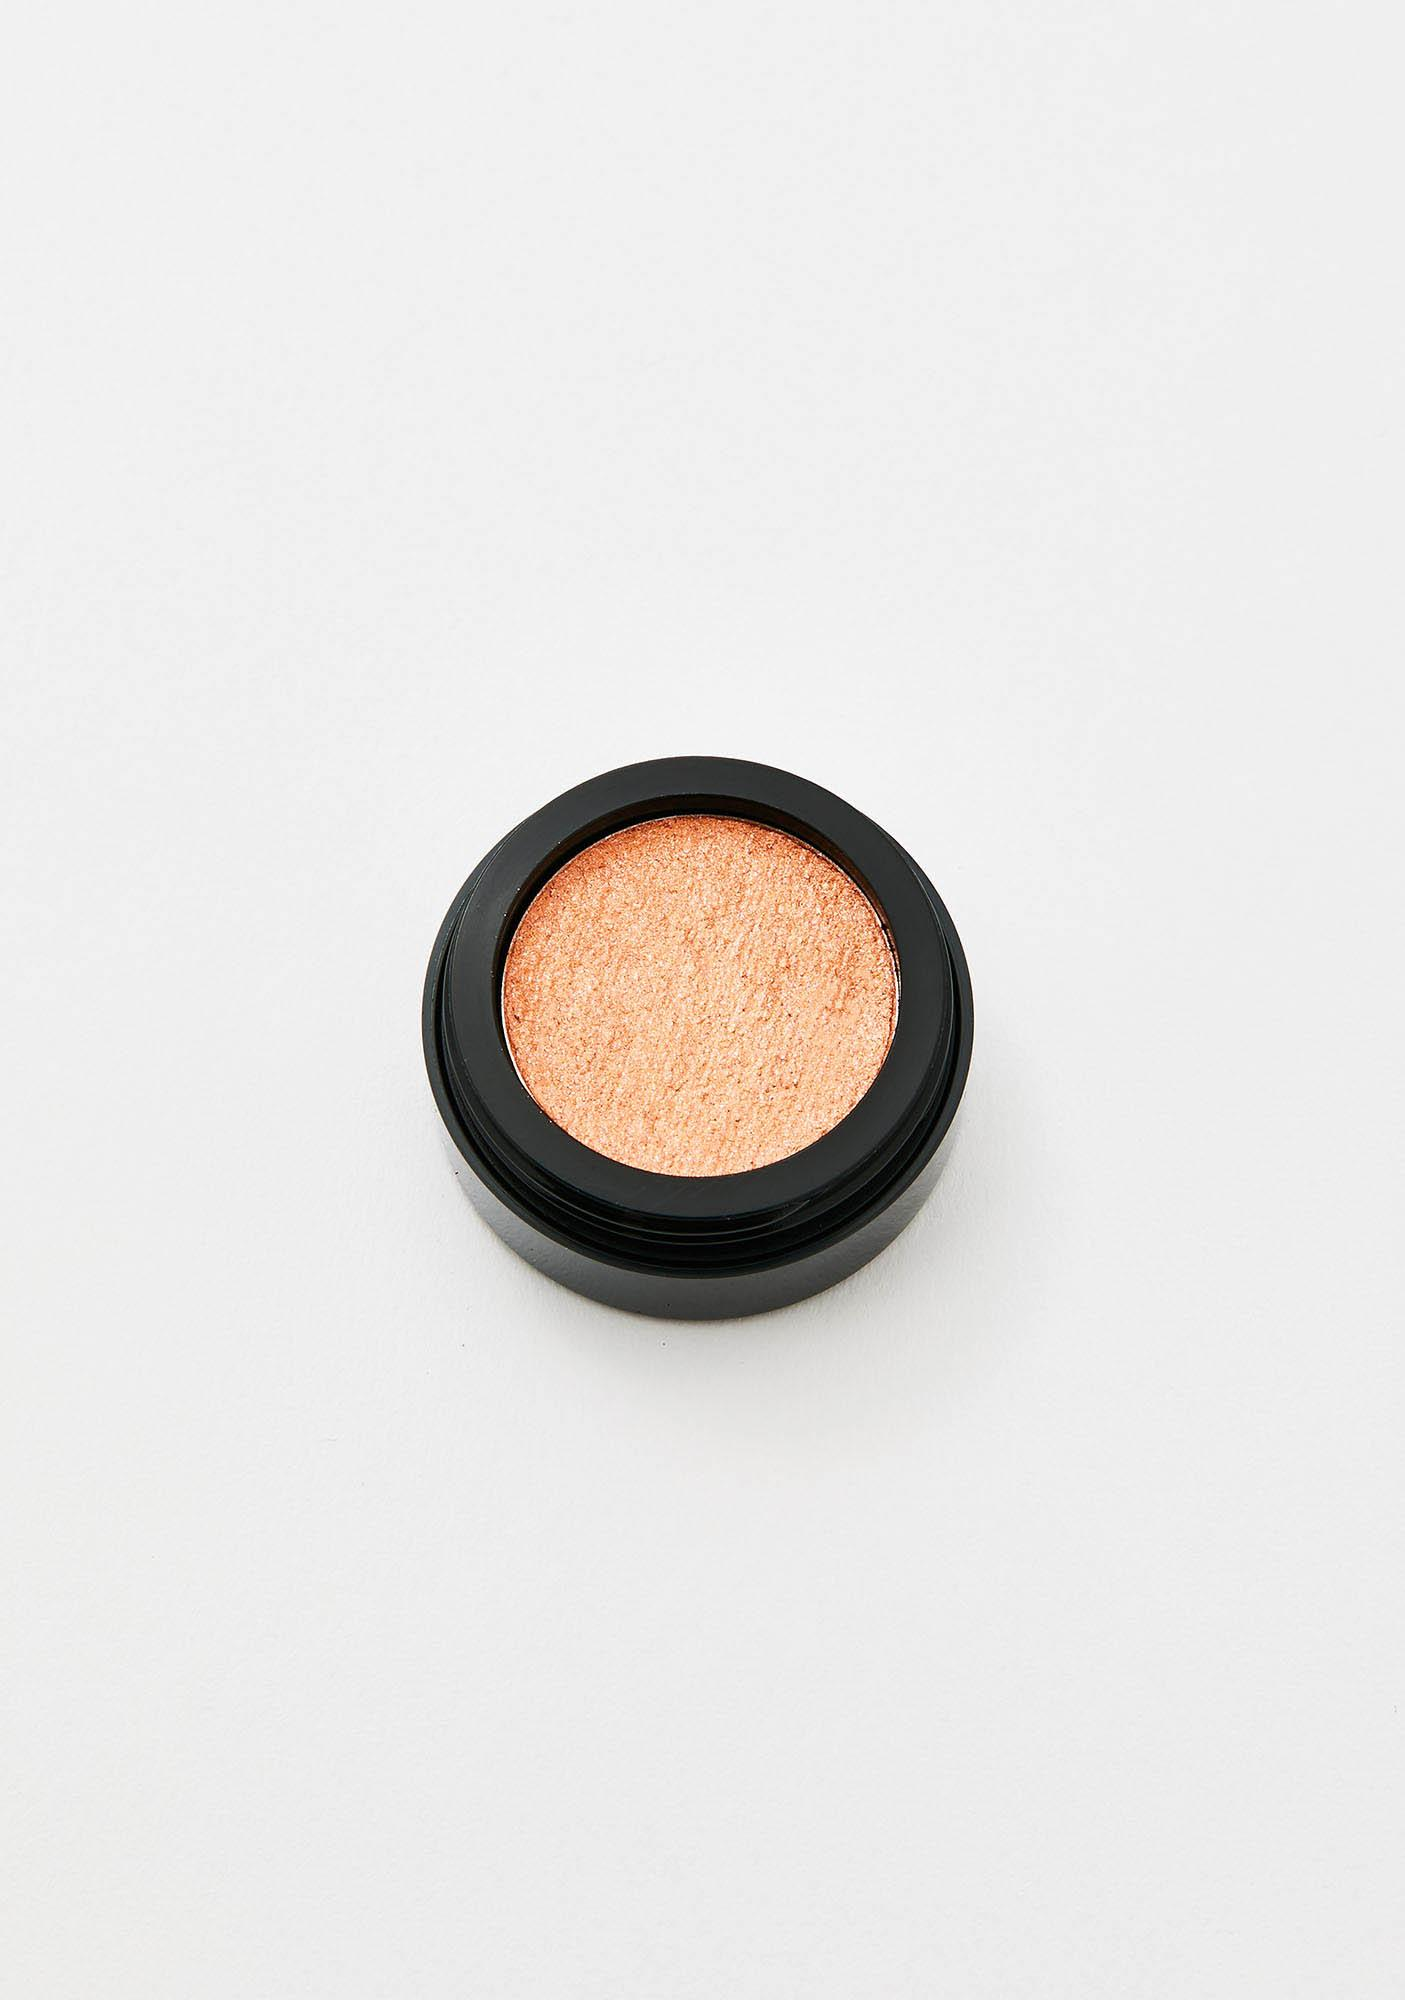 NYX Professional Makeup Baroque Foil Play Cream Eyeshadow